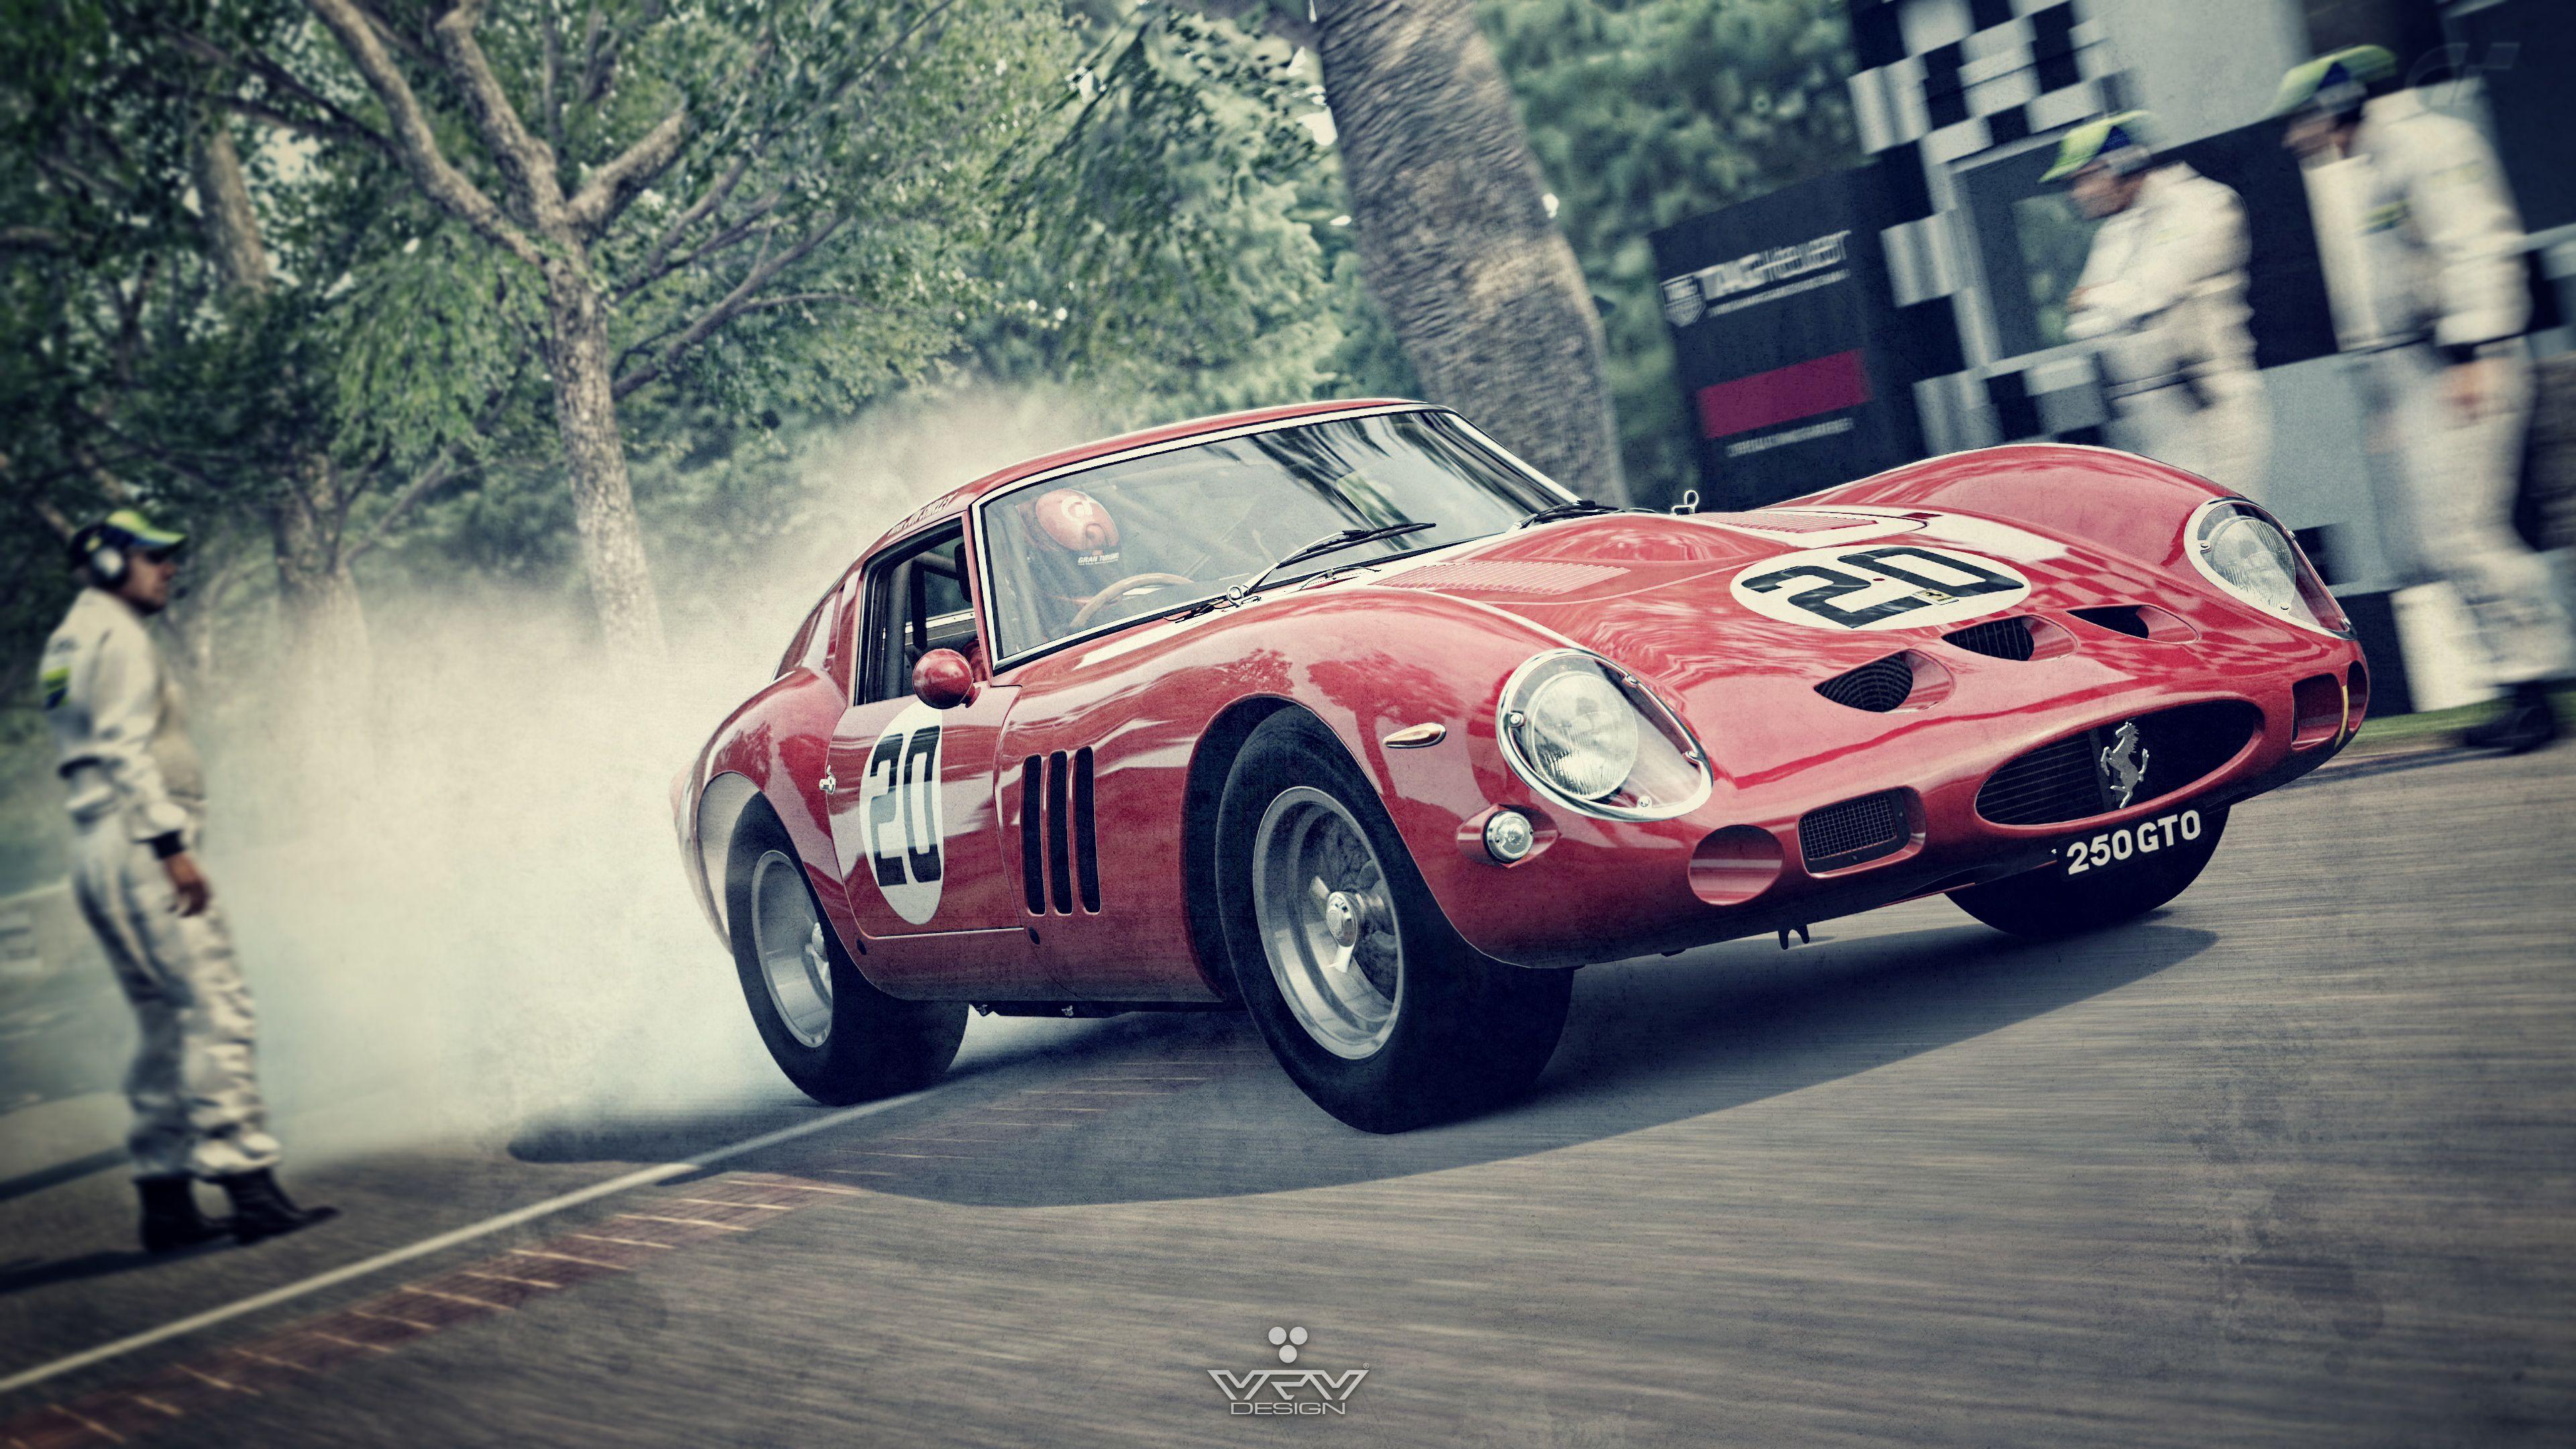 Ferrari 250 Gto Wallpapers: Ferrari 250 GTO Wallpapers